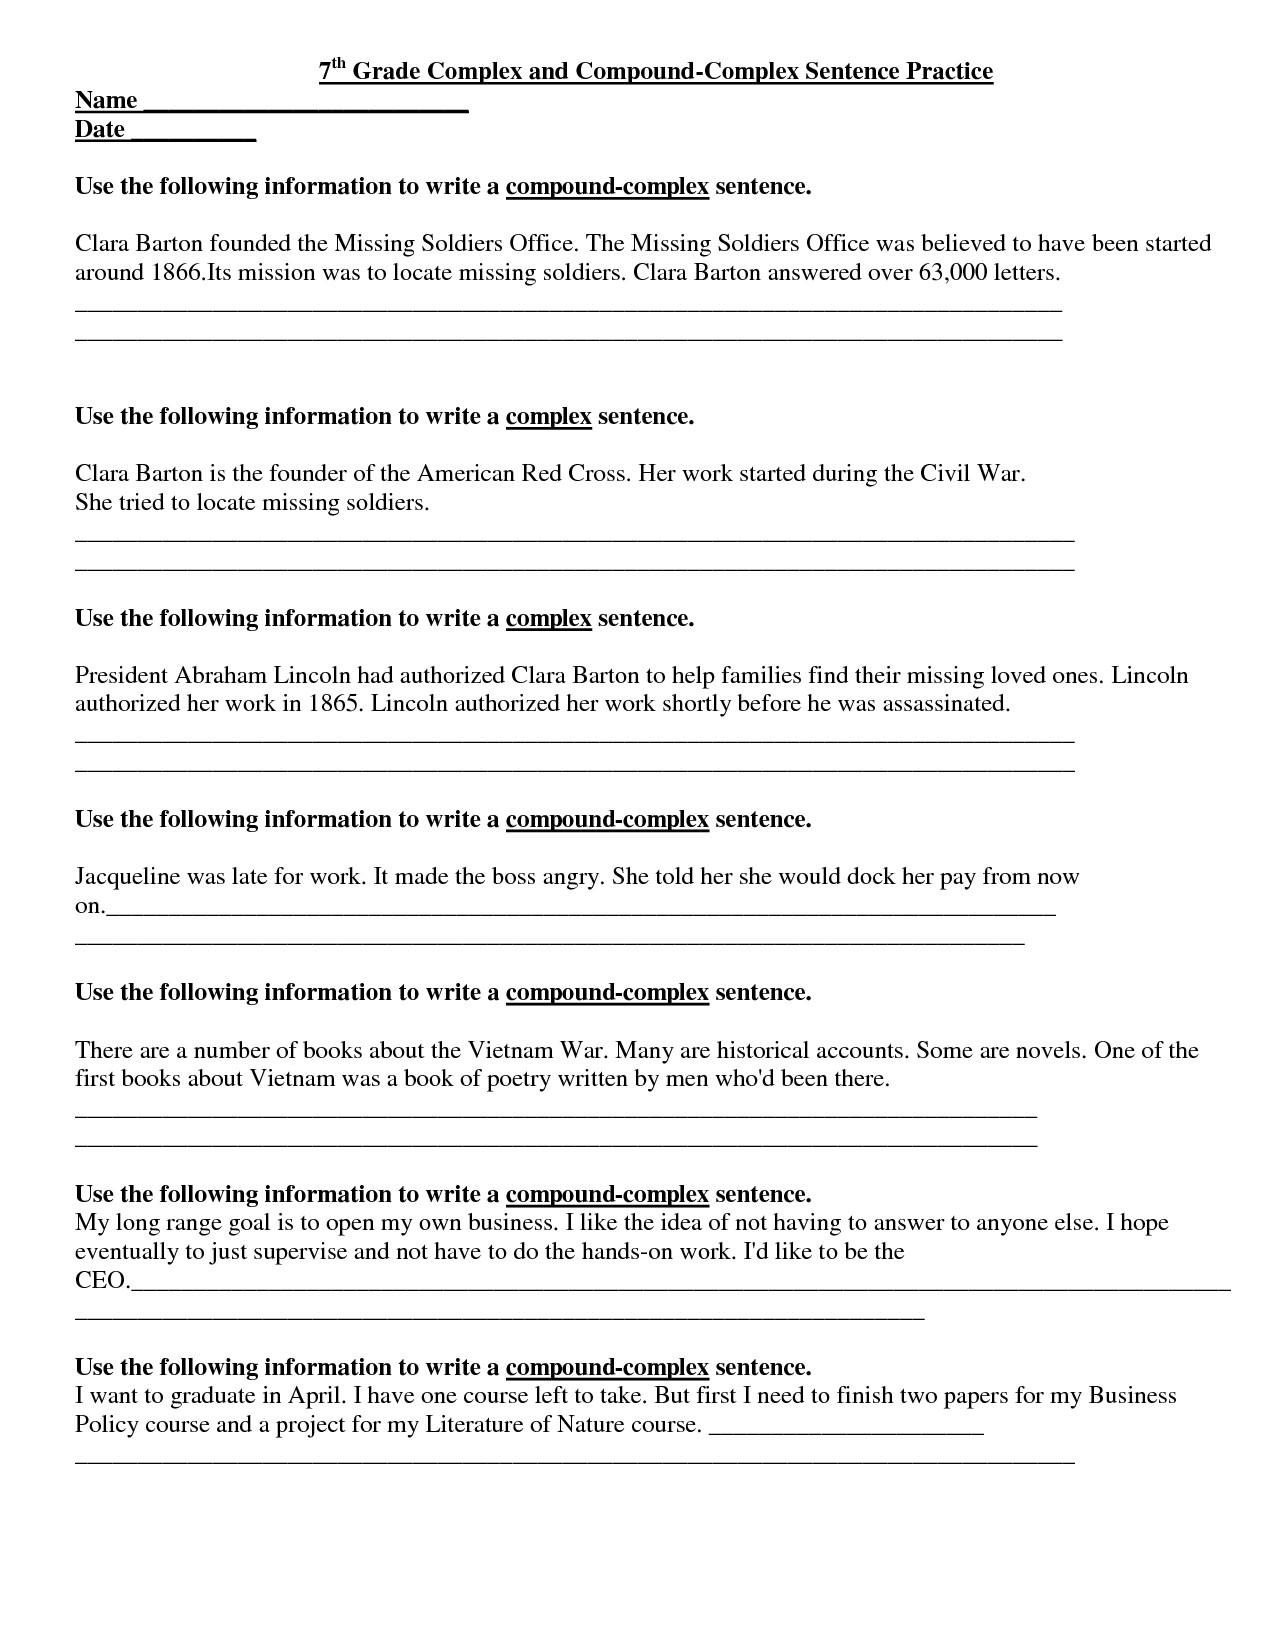 Free Printable 7Th Grade Reading Comprehension Worksheets Free - 7Th Grade Worksheets Free Printable